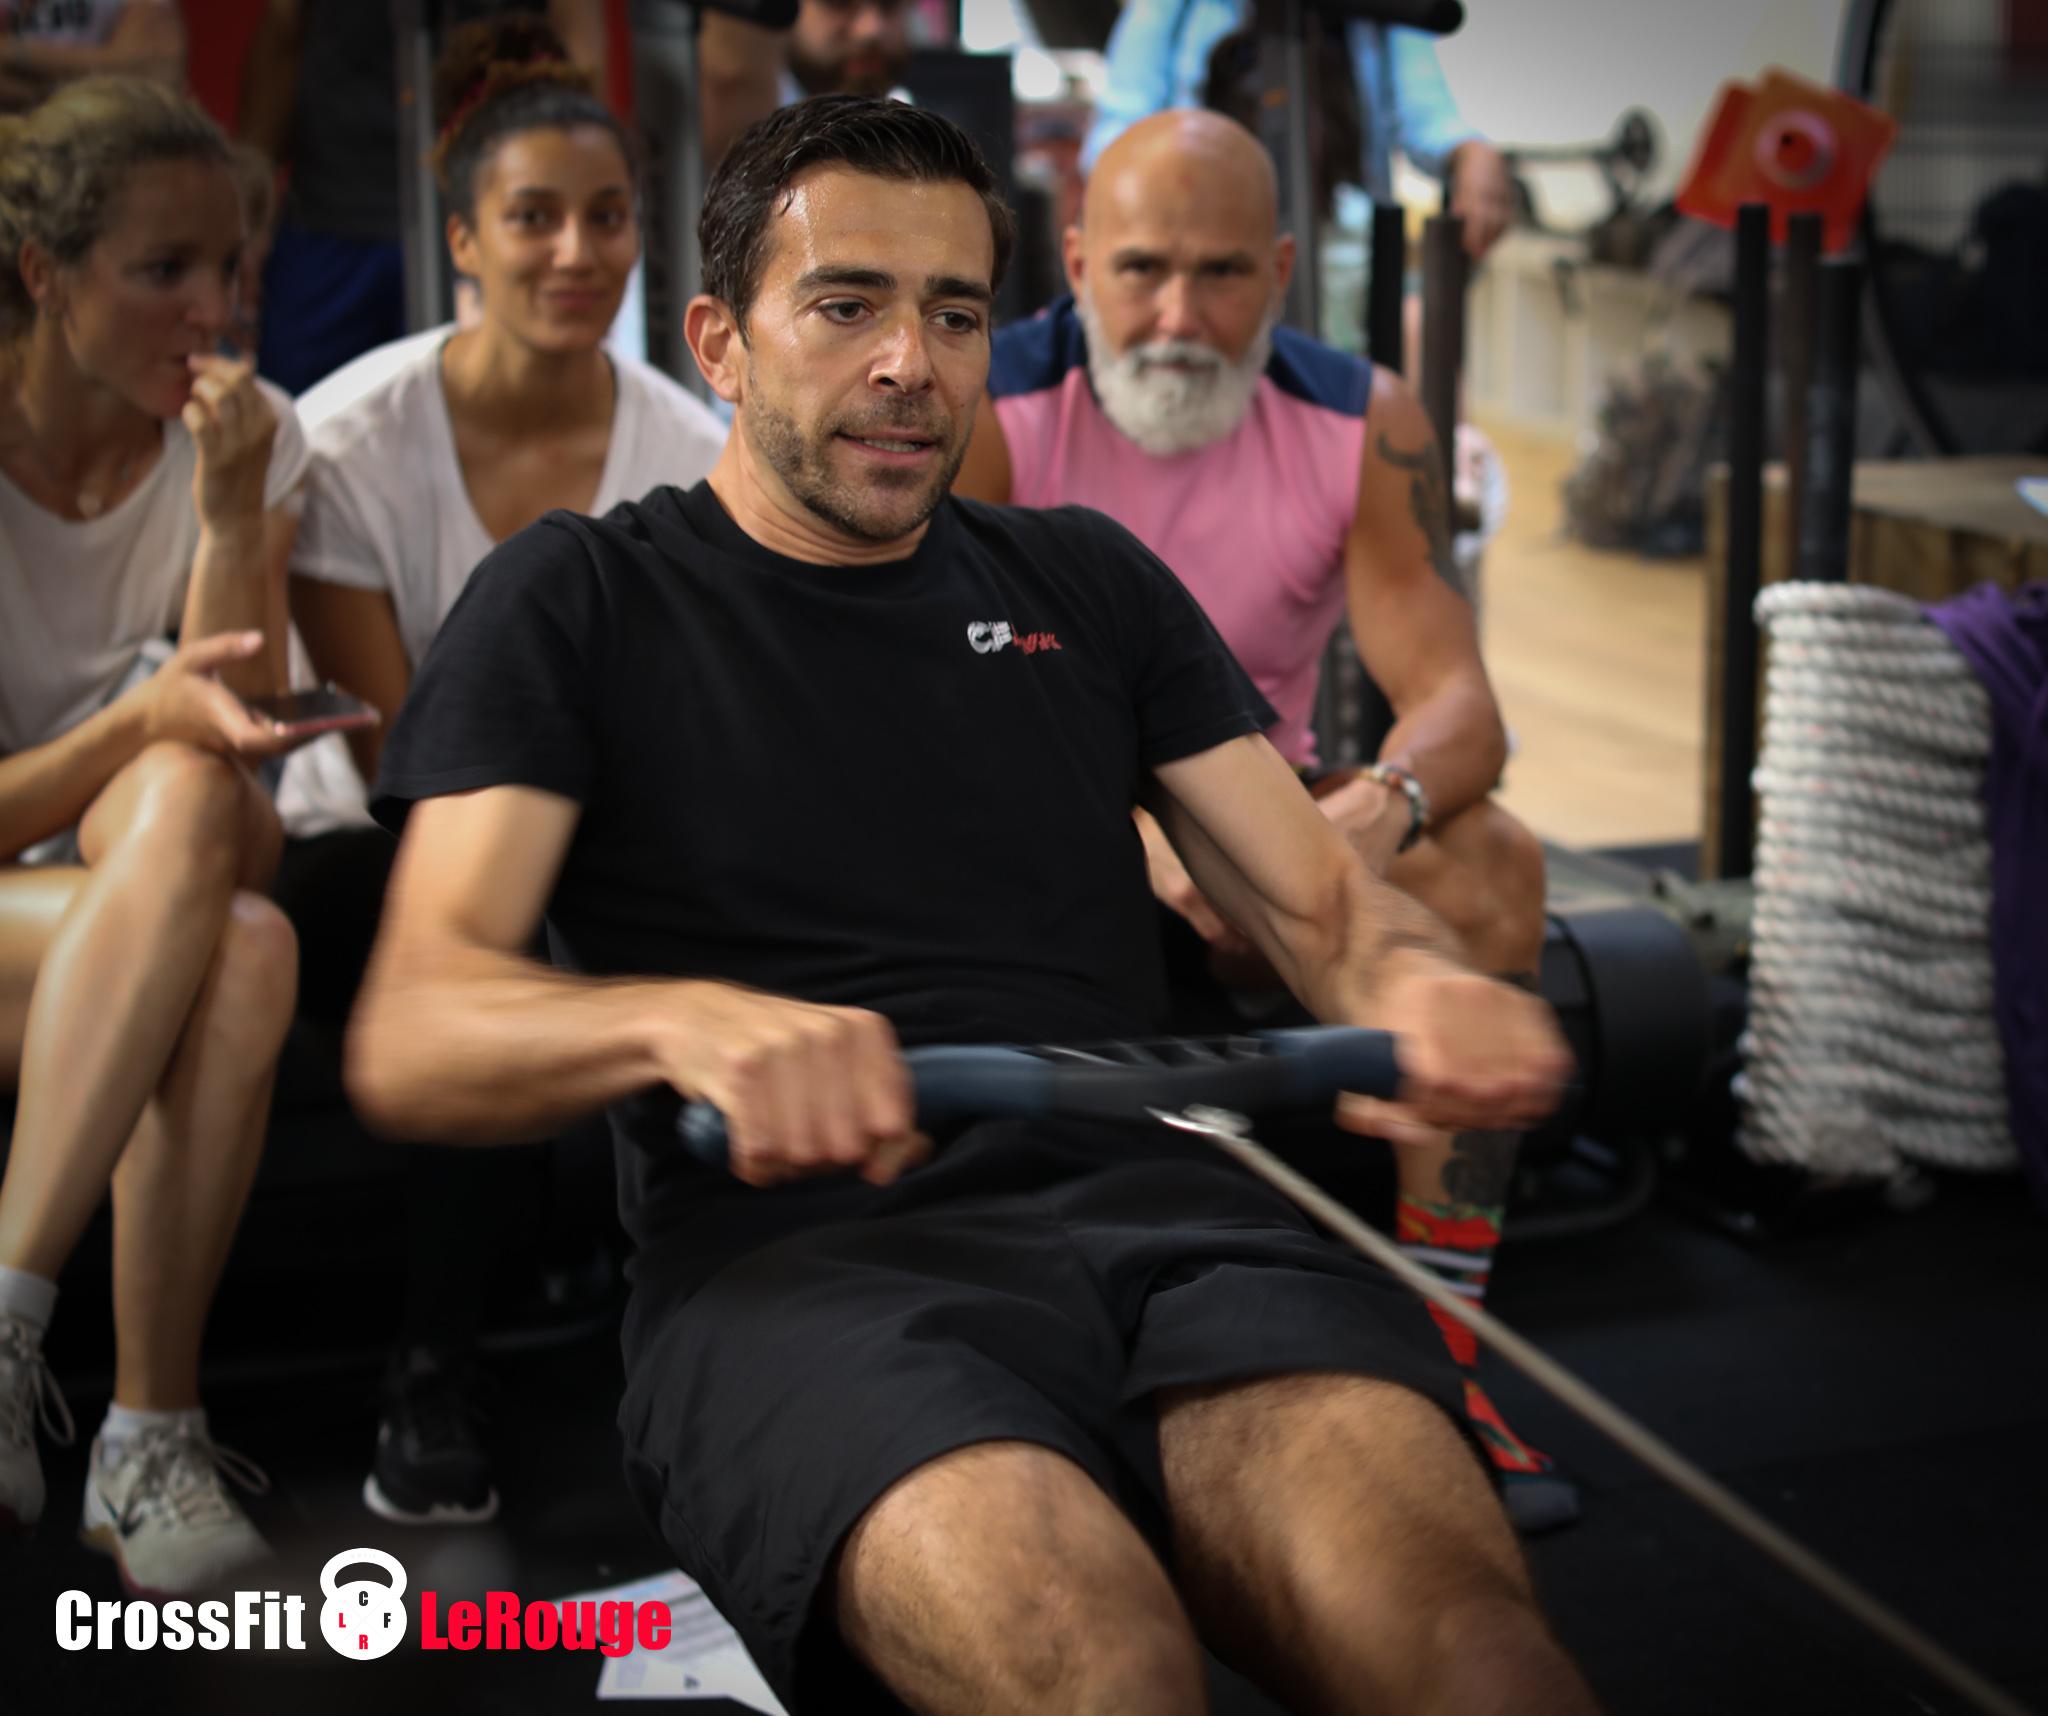 CrossFit WOD rowing deadlift box-jumps